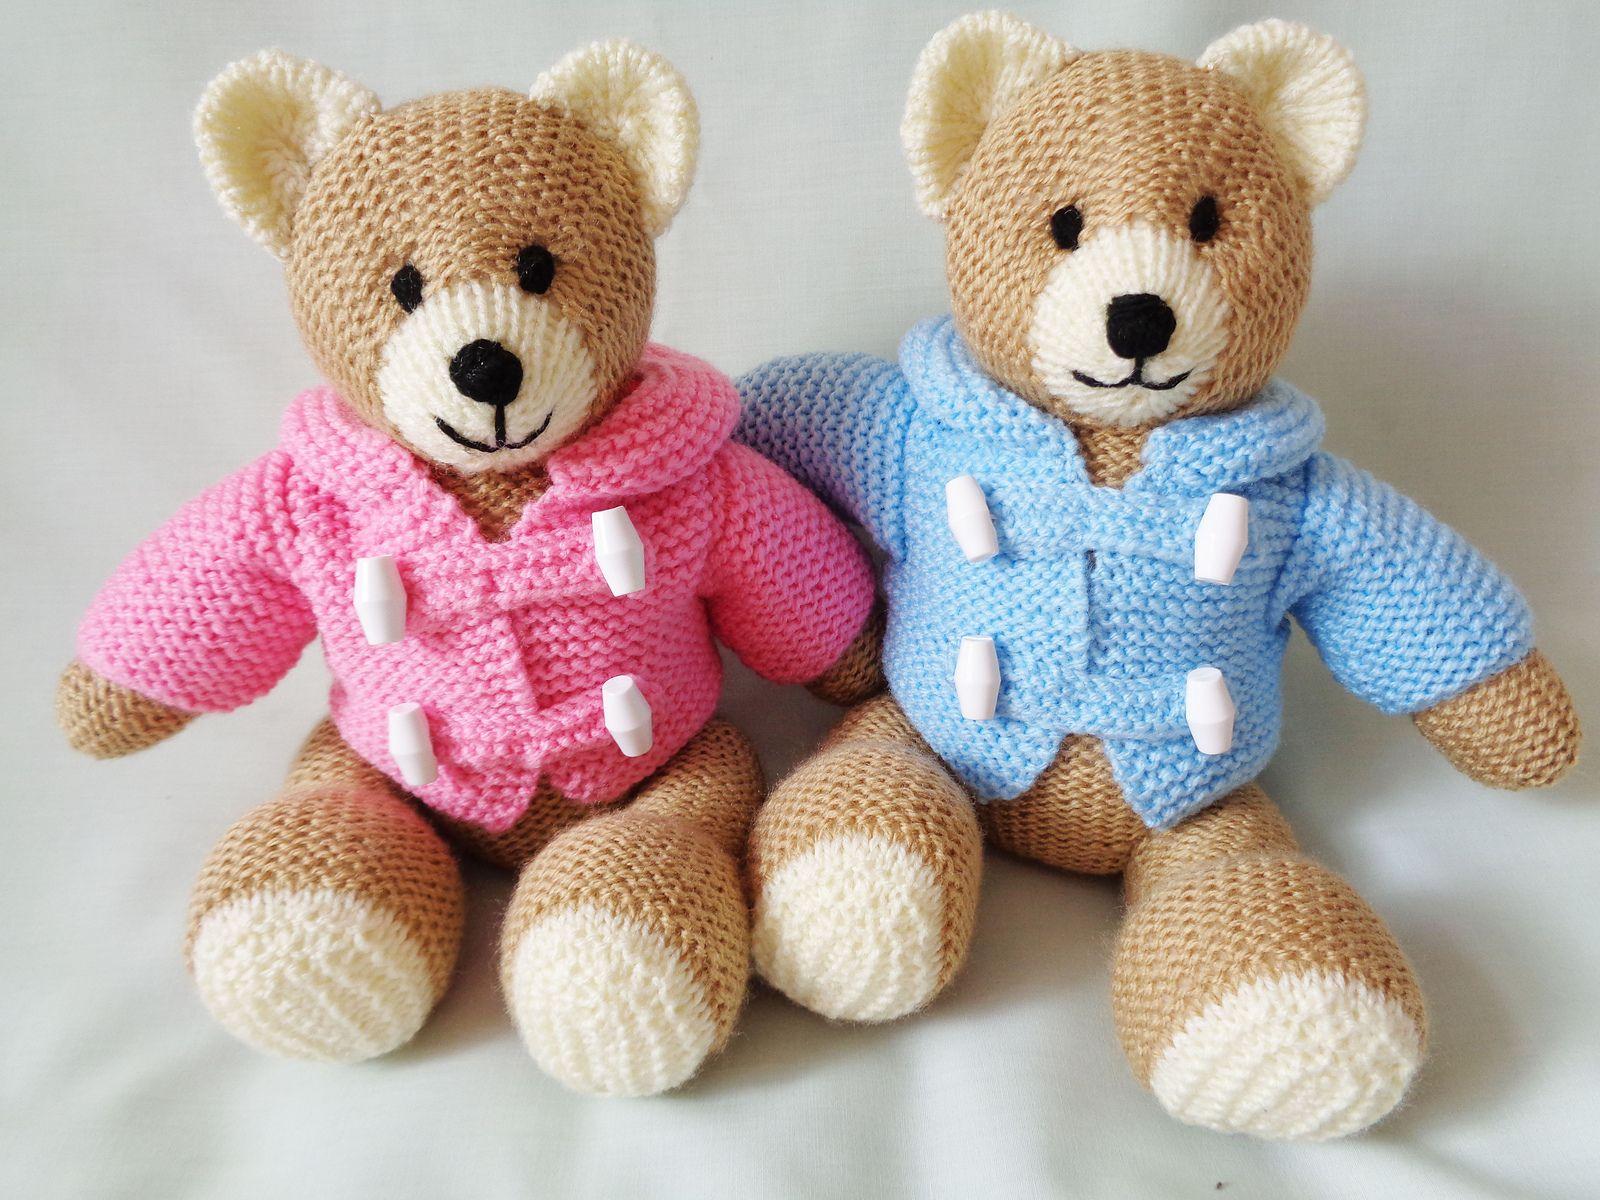 Little Dazzler Teddy Bear in 2020 | Teddy bear knitting ...